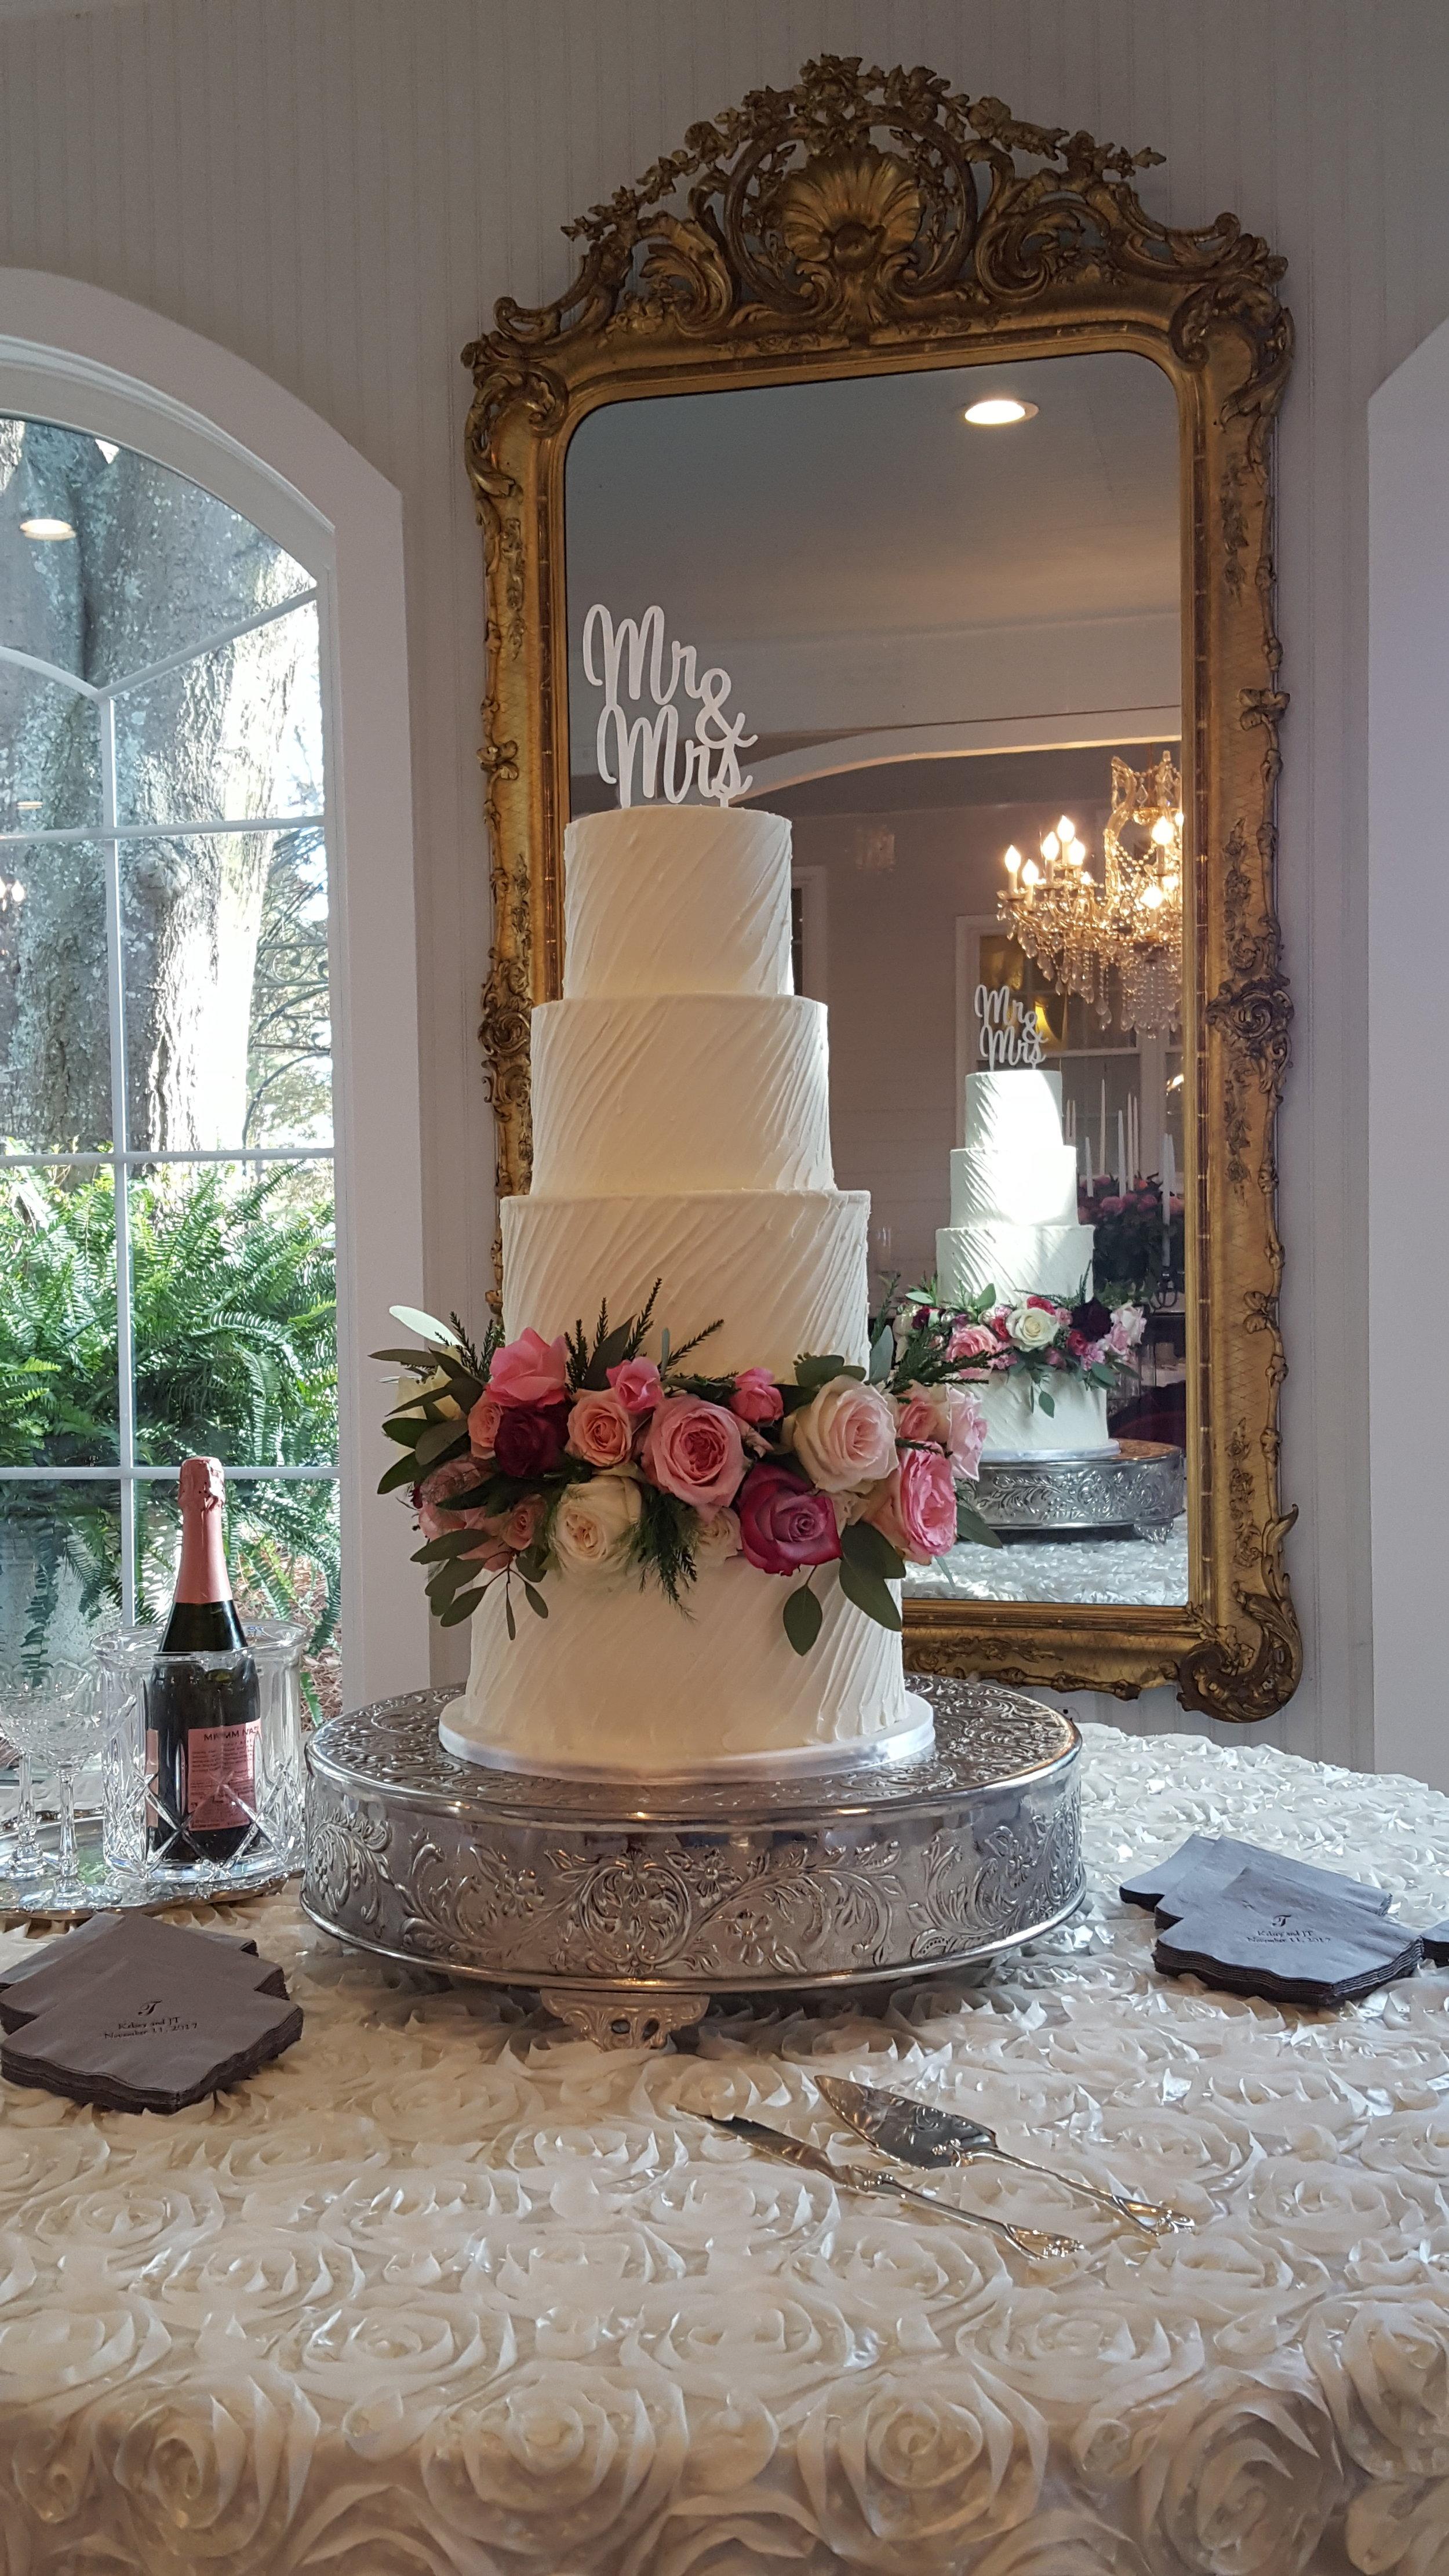 Weddings - Experience it here...